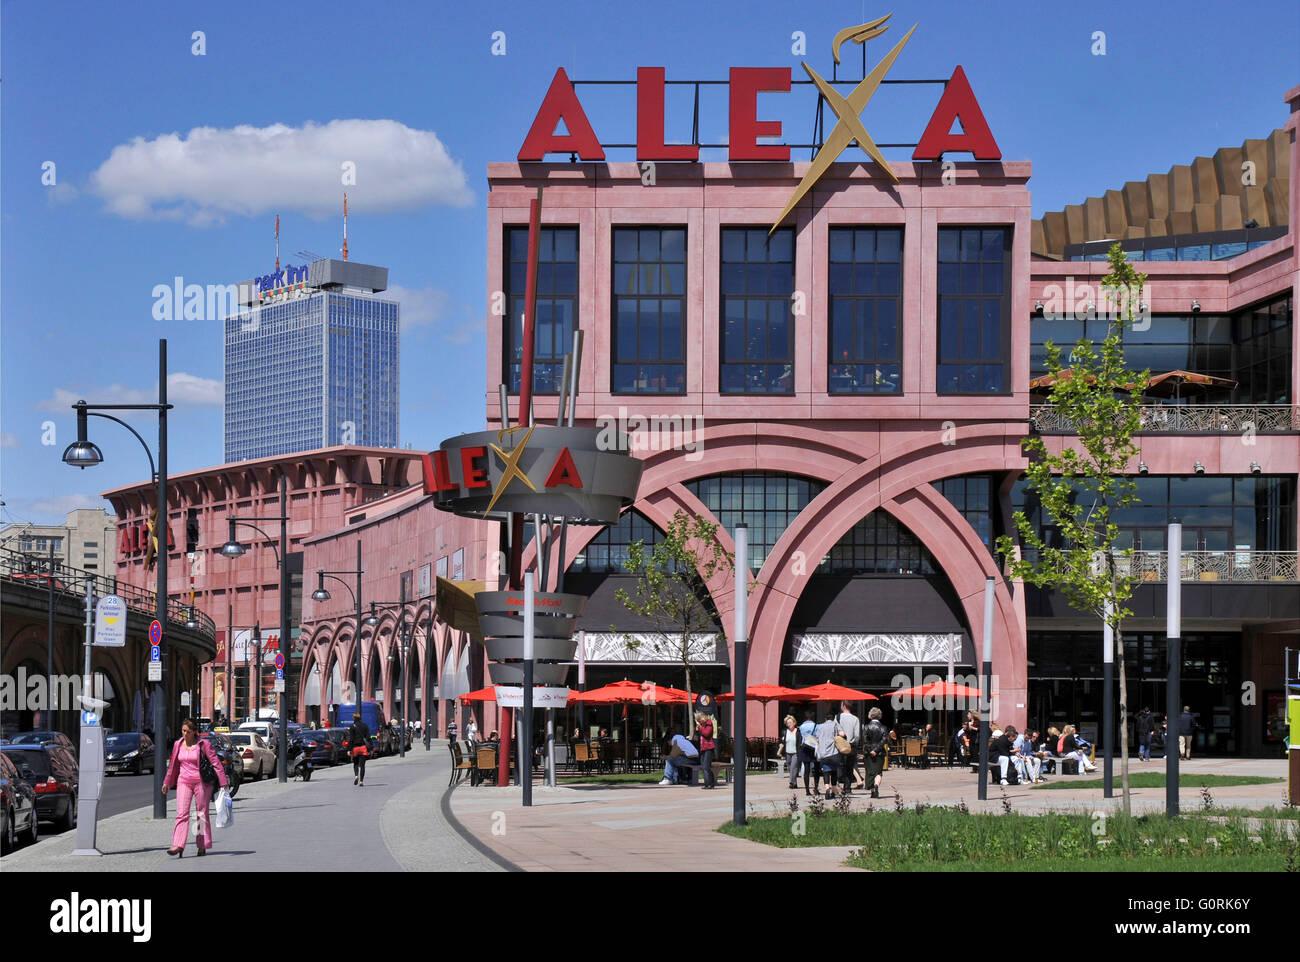 shopping mall alexa alexanderplatz dircksenstrasse mitte berlin stock photo 103782195 alamy. Black Bedroom Furniture Sets. Home Design Ideas